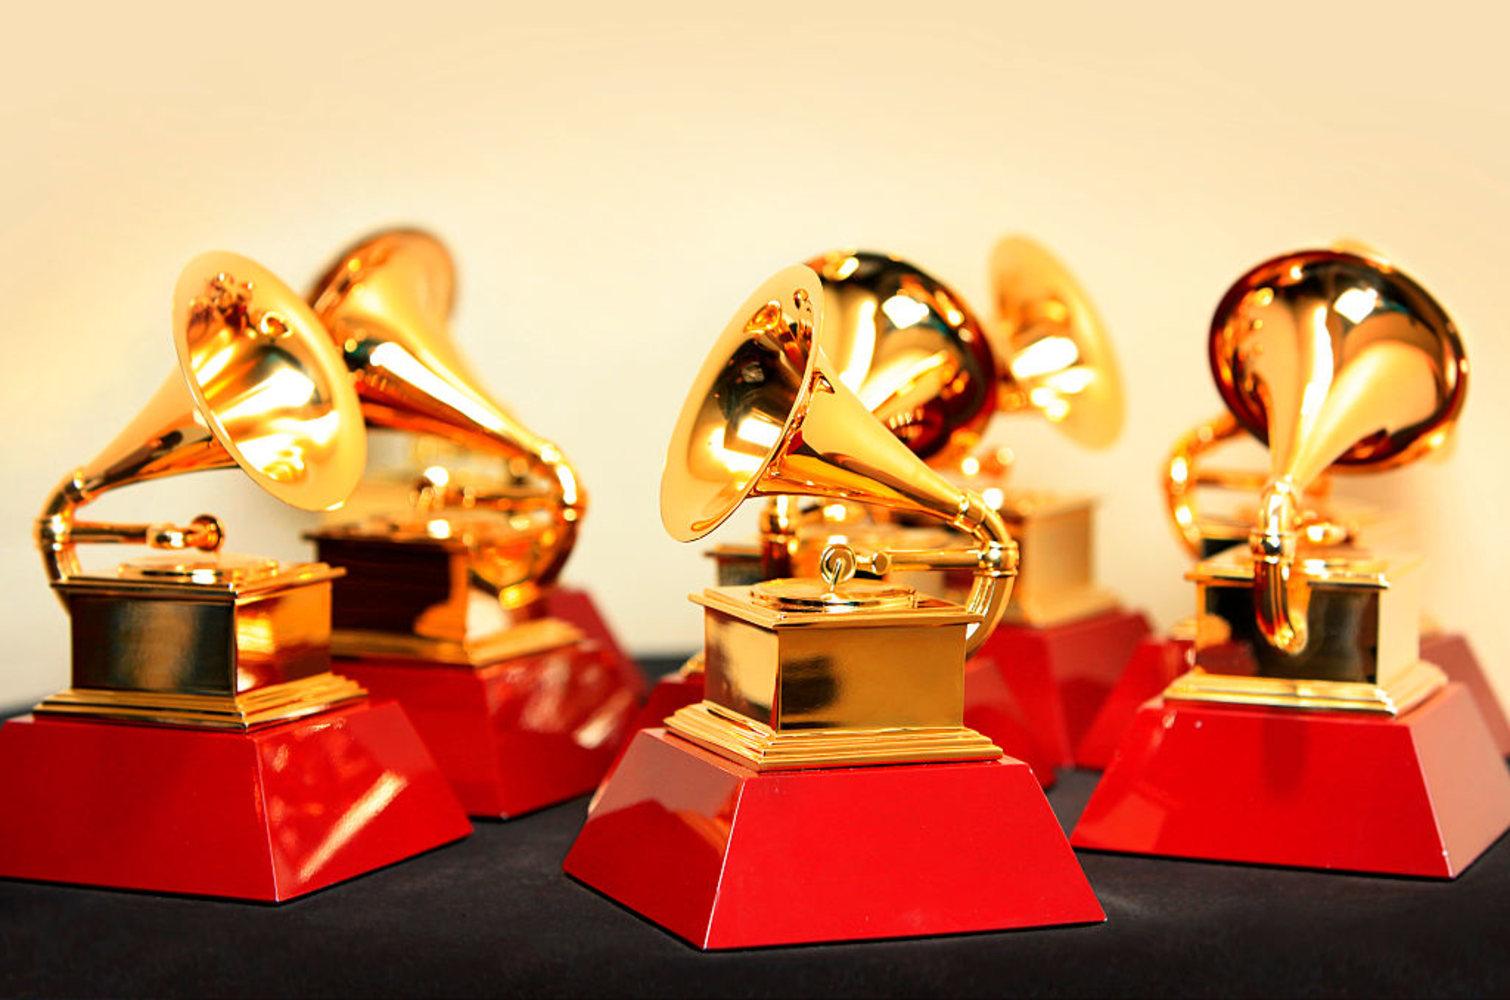 Grammy Awards preview: Host James Corden has plans